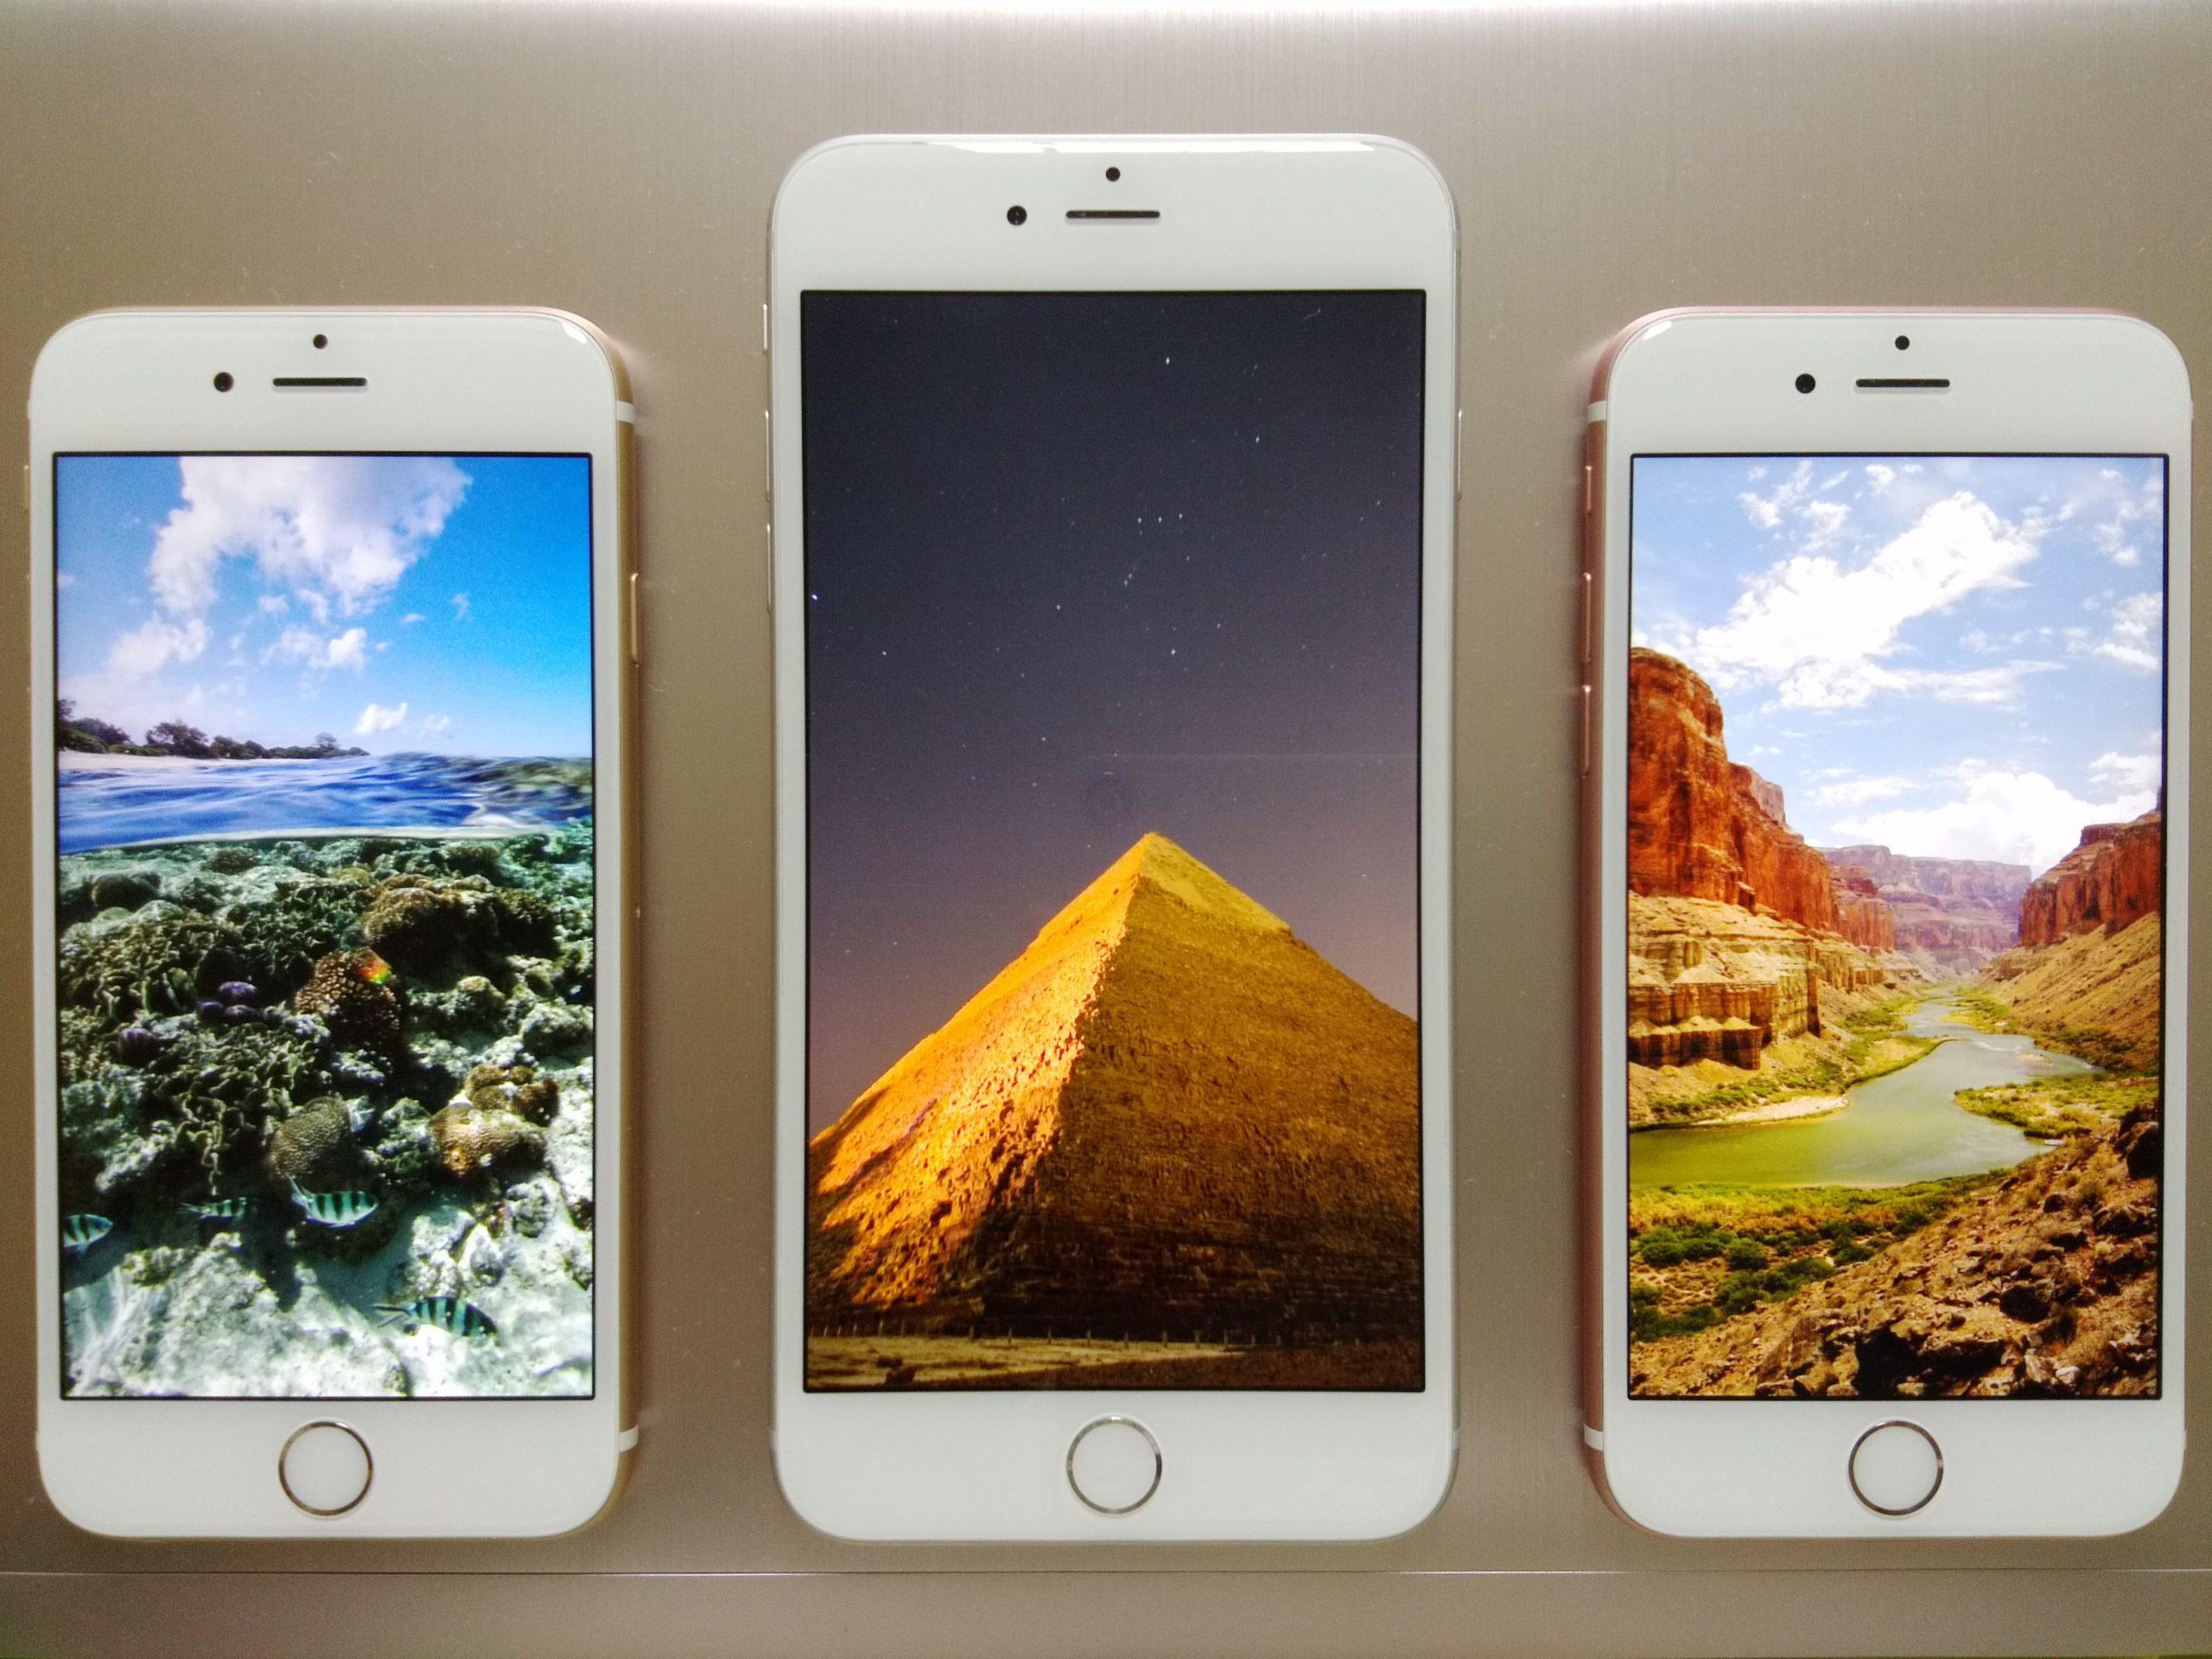 cadena de suministro iphone